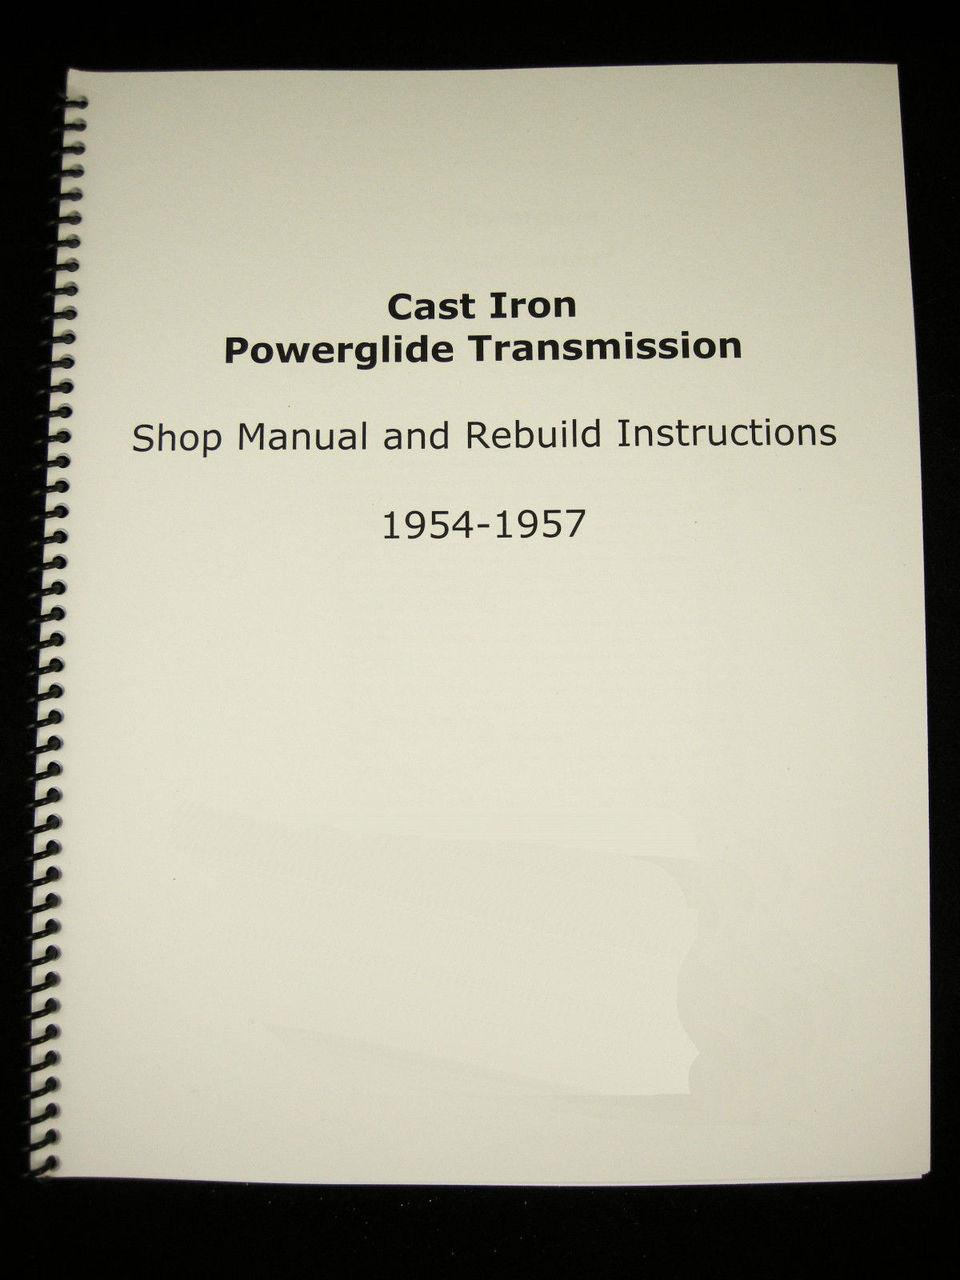 1954-1957 Cast Iron Powerglide Manual & Overhaul Rebuild Instructions